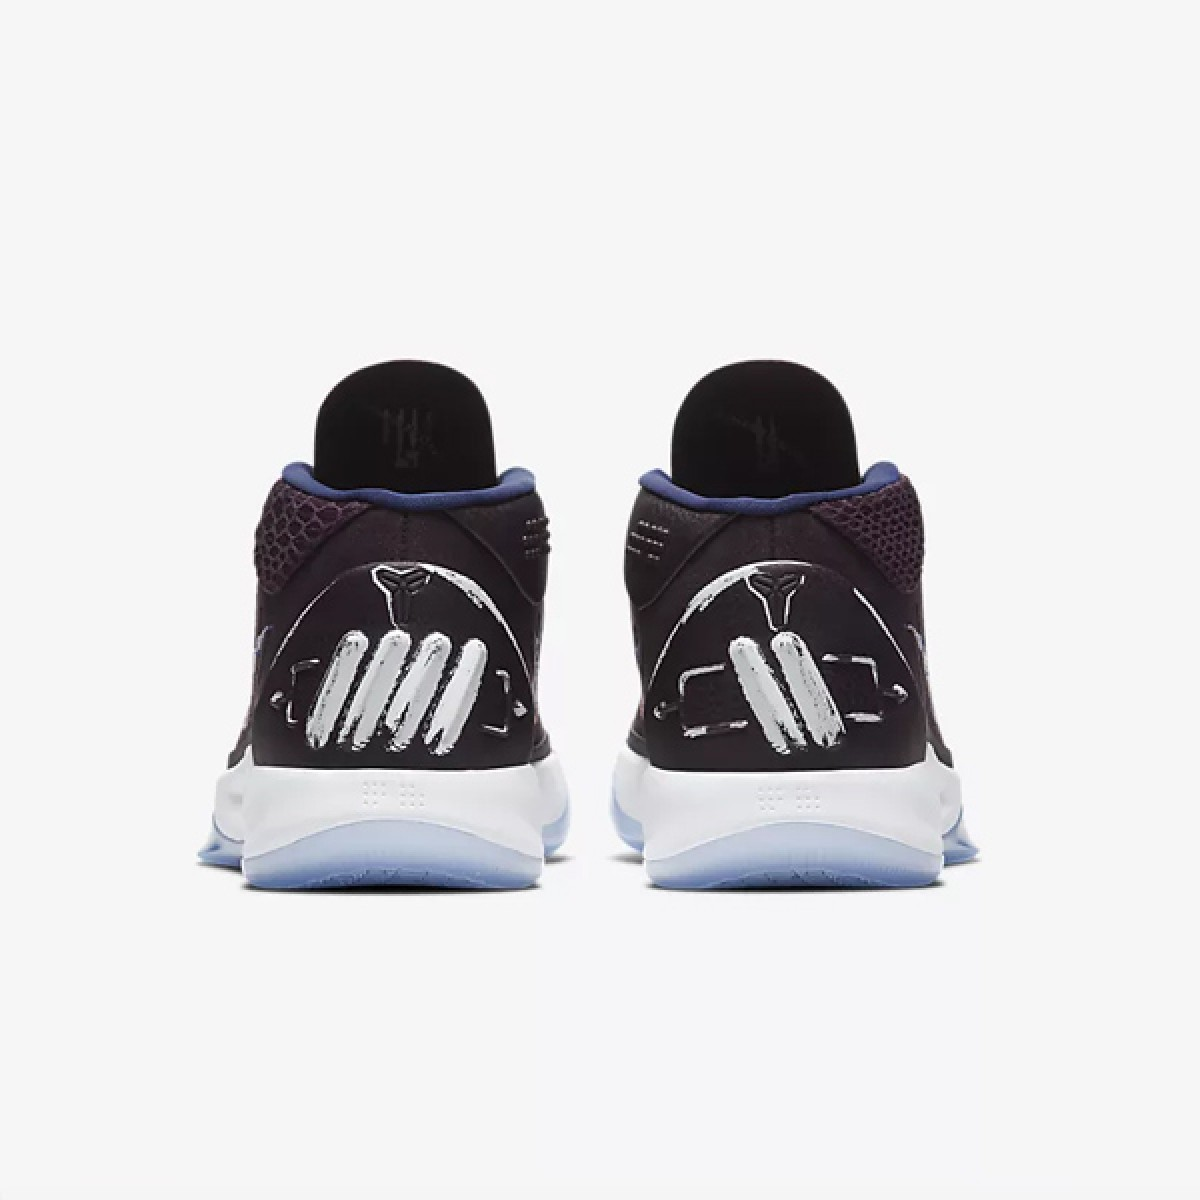 7c3c5bc8b892 Buy Nike Kobe AD Mid  Port Wine  Basketball shoes   sneakers